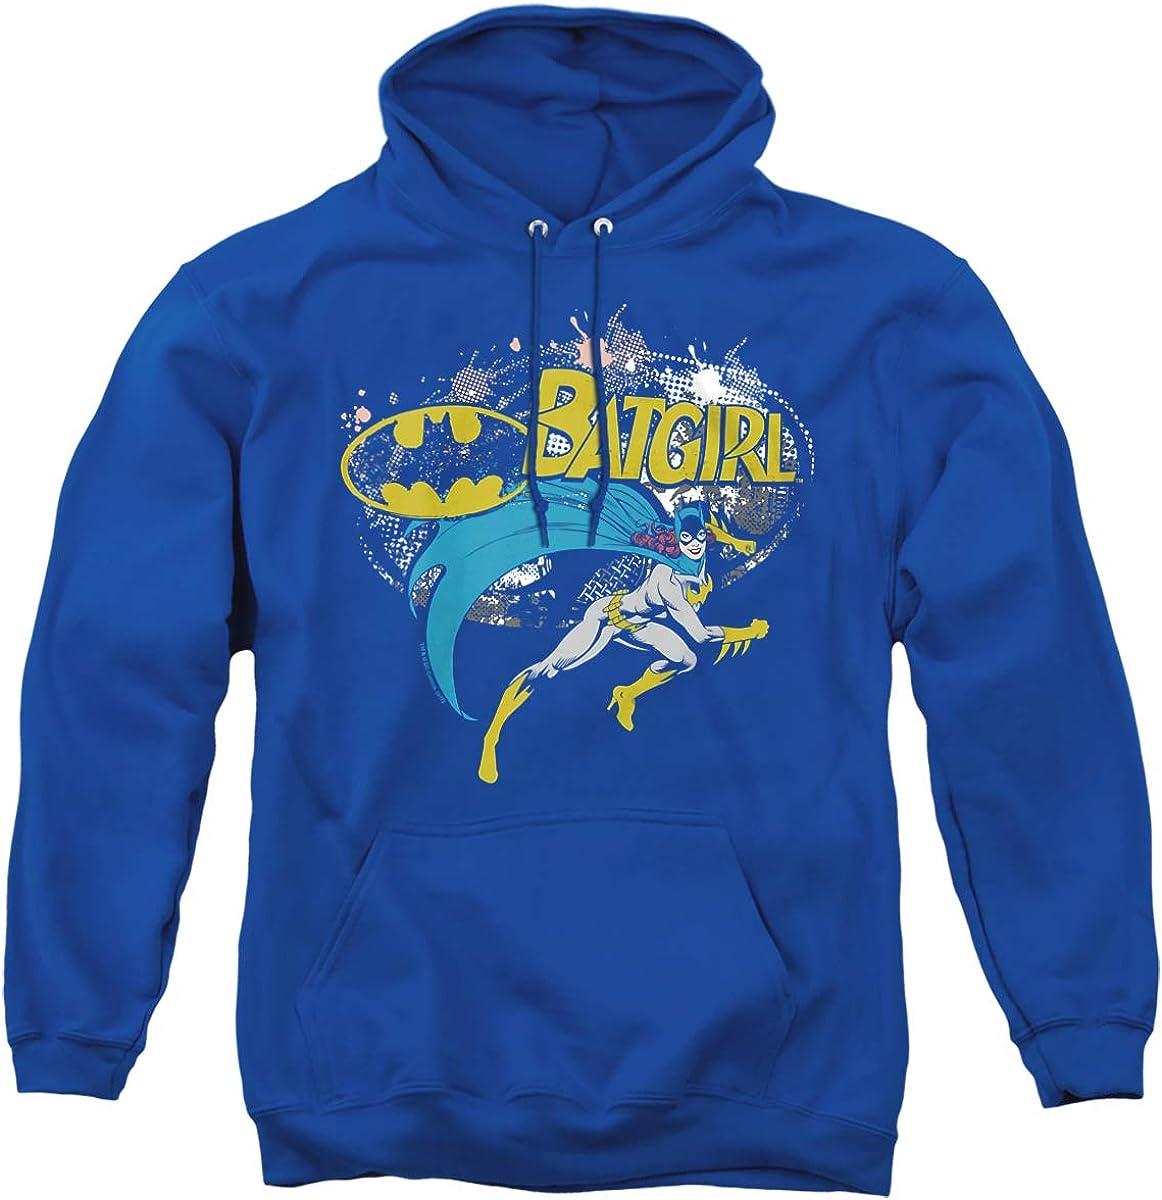 Batman Batgirl Halftone Direct store Unisex Hoodie Adult Pull-Over Product